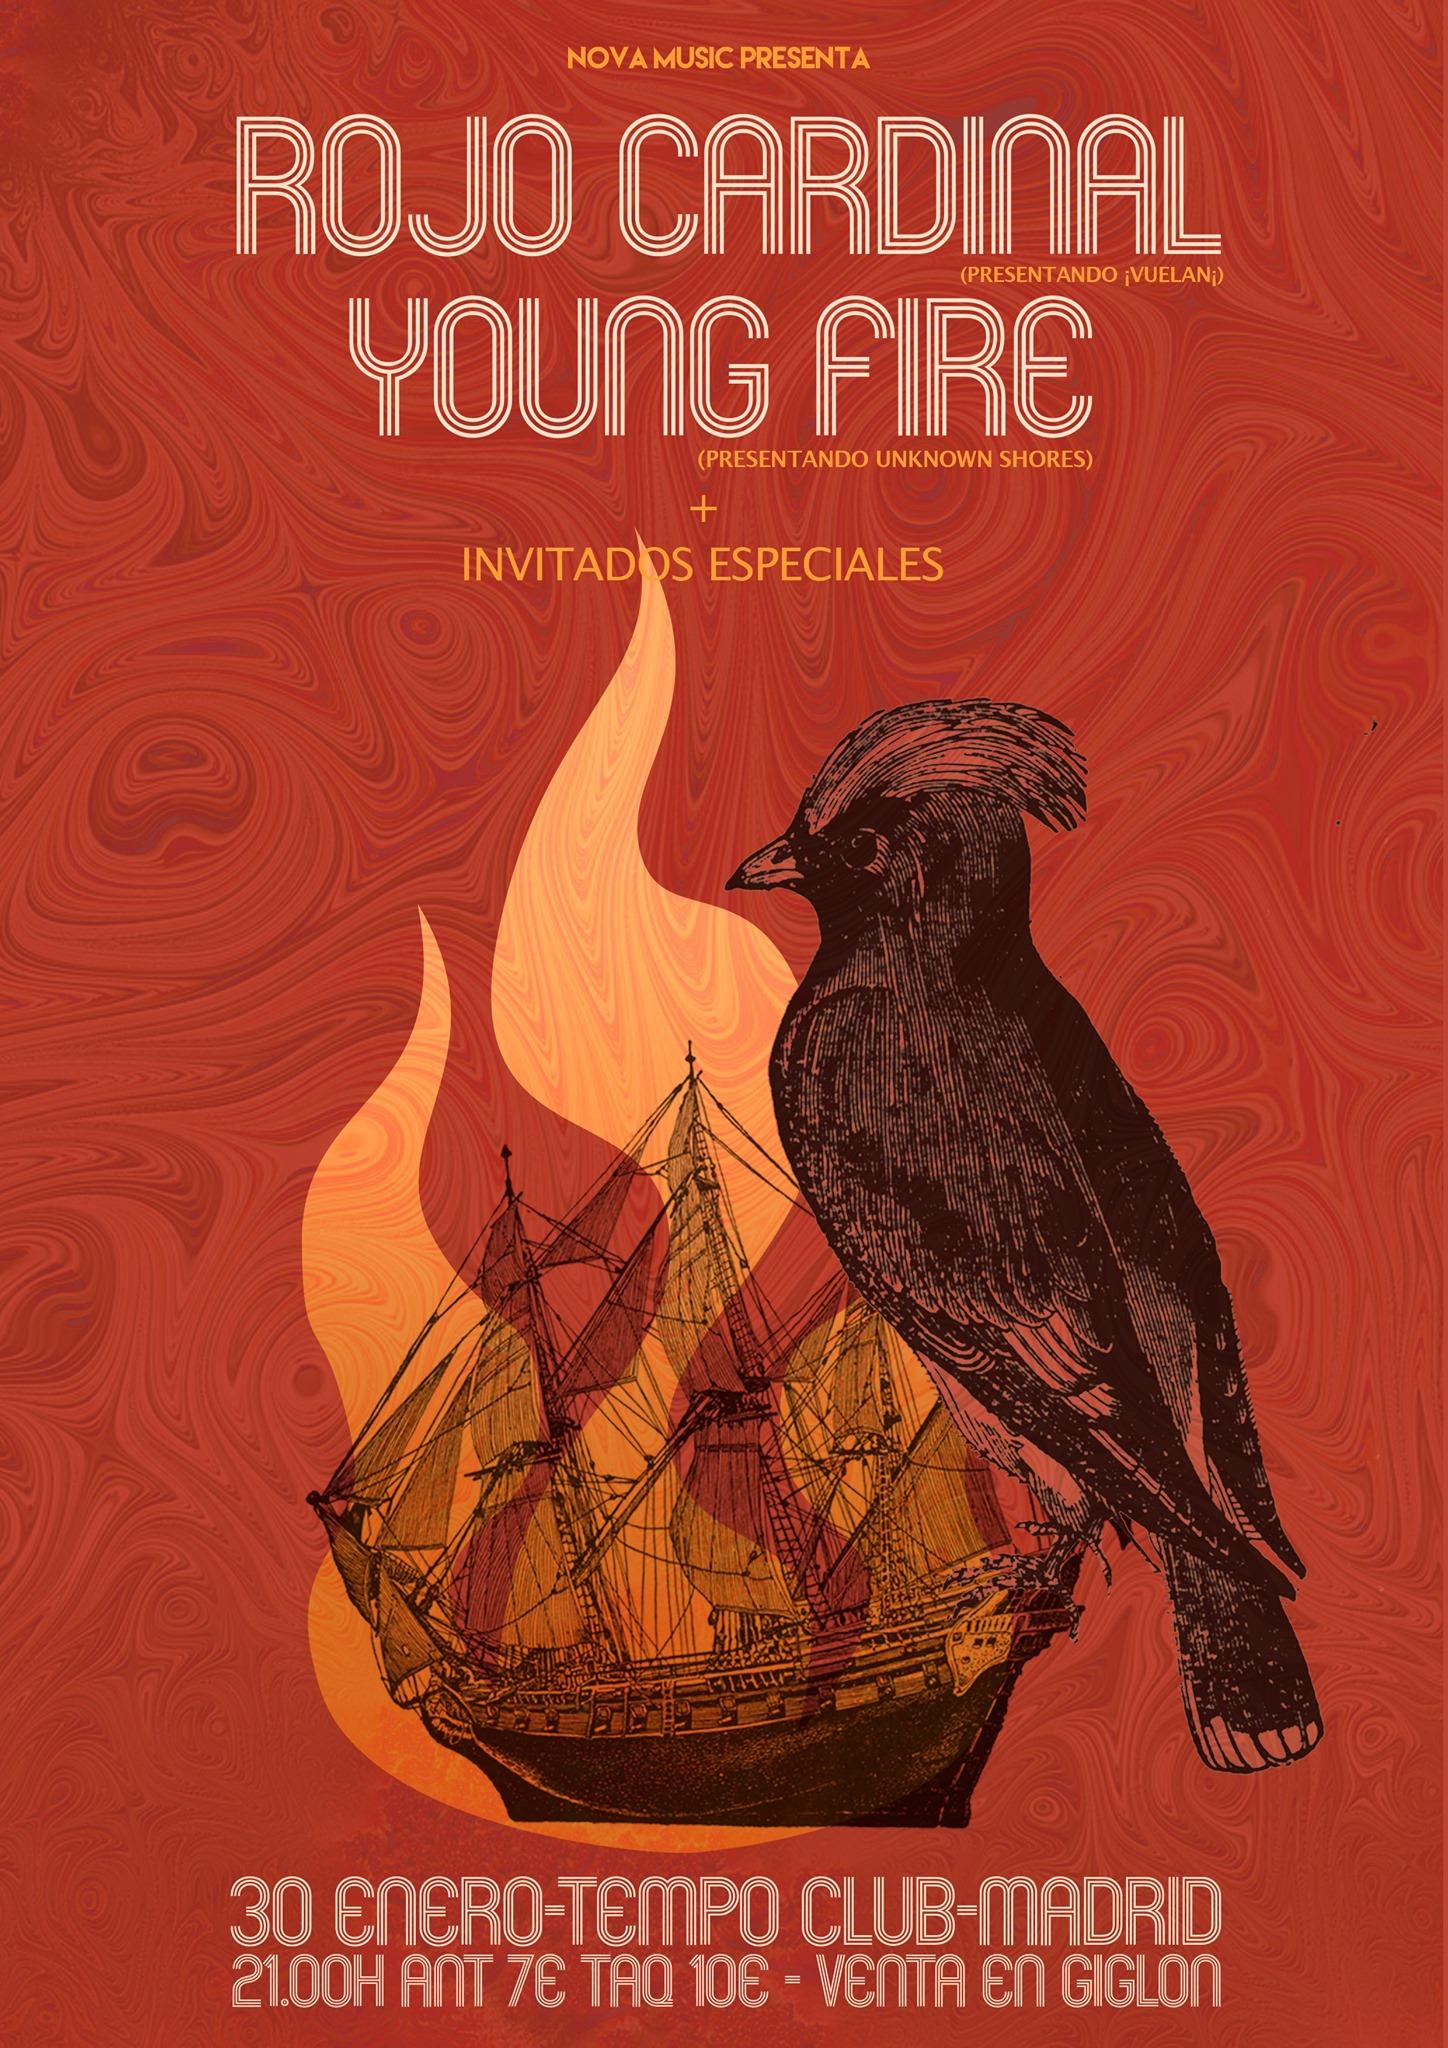 Rojo Cardinal + Young Fire